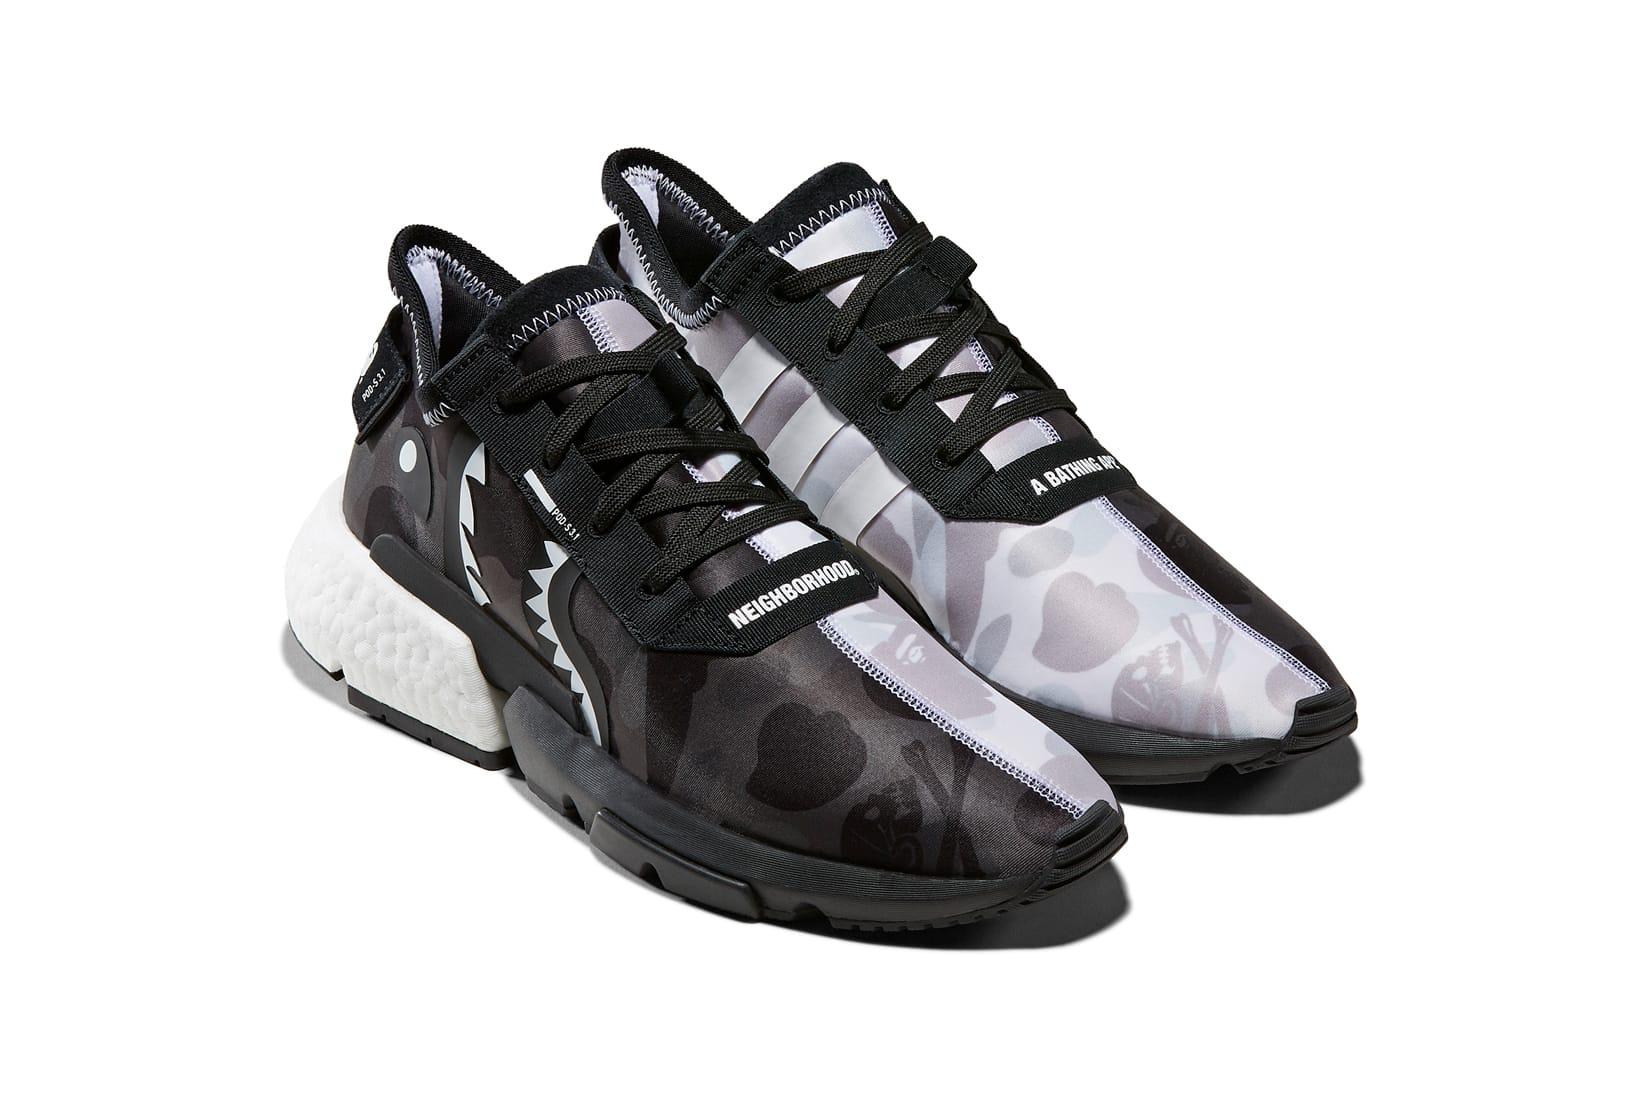 BAPE x Neighborhood x adidas Sneaker